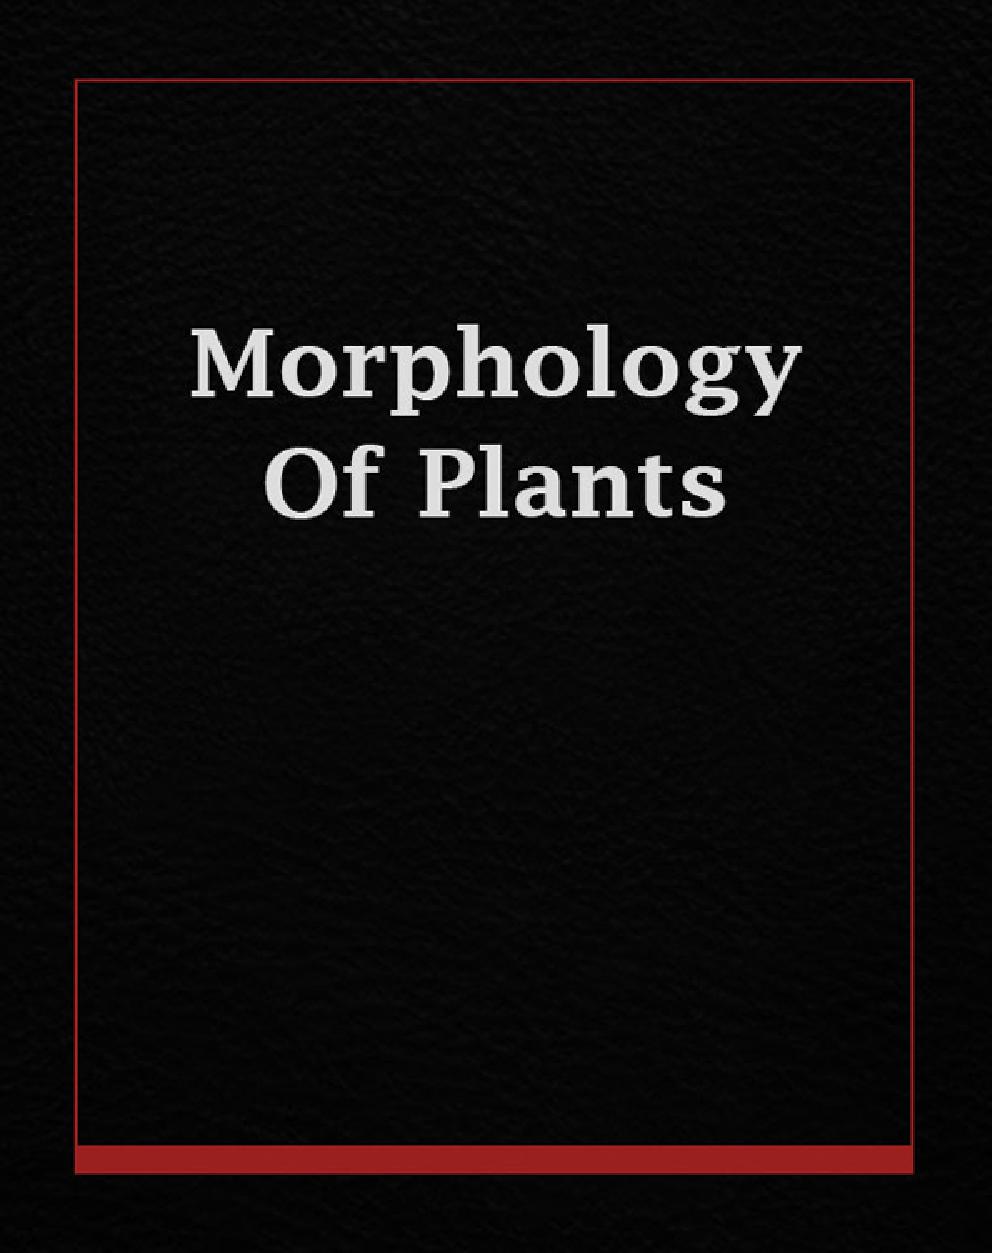 Morphology Of Plants - Page 1